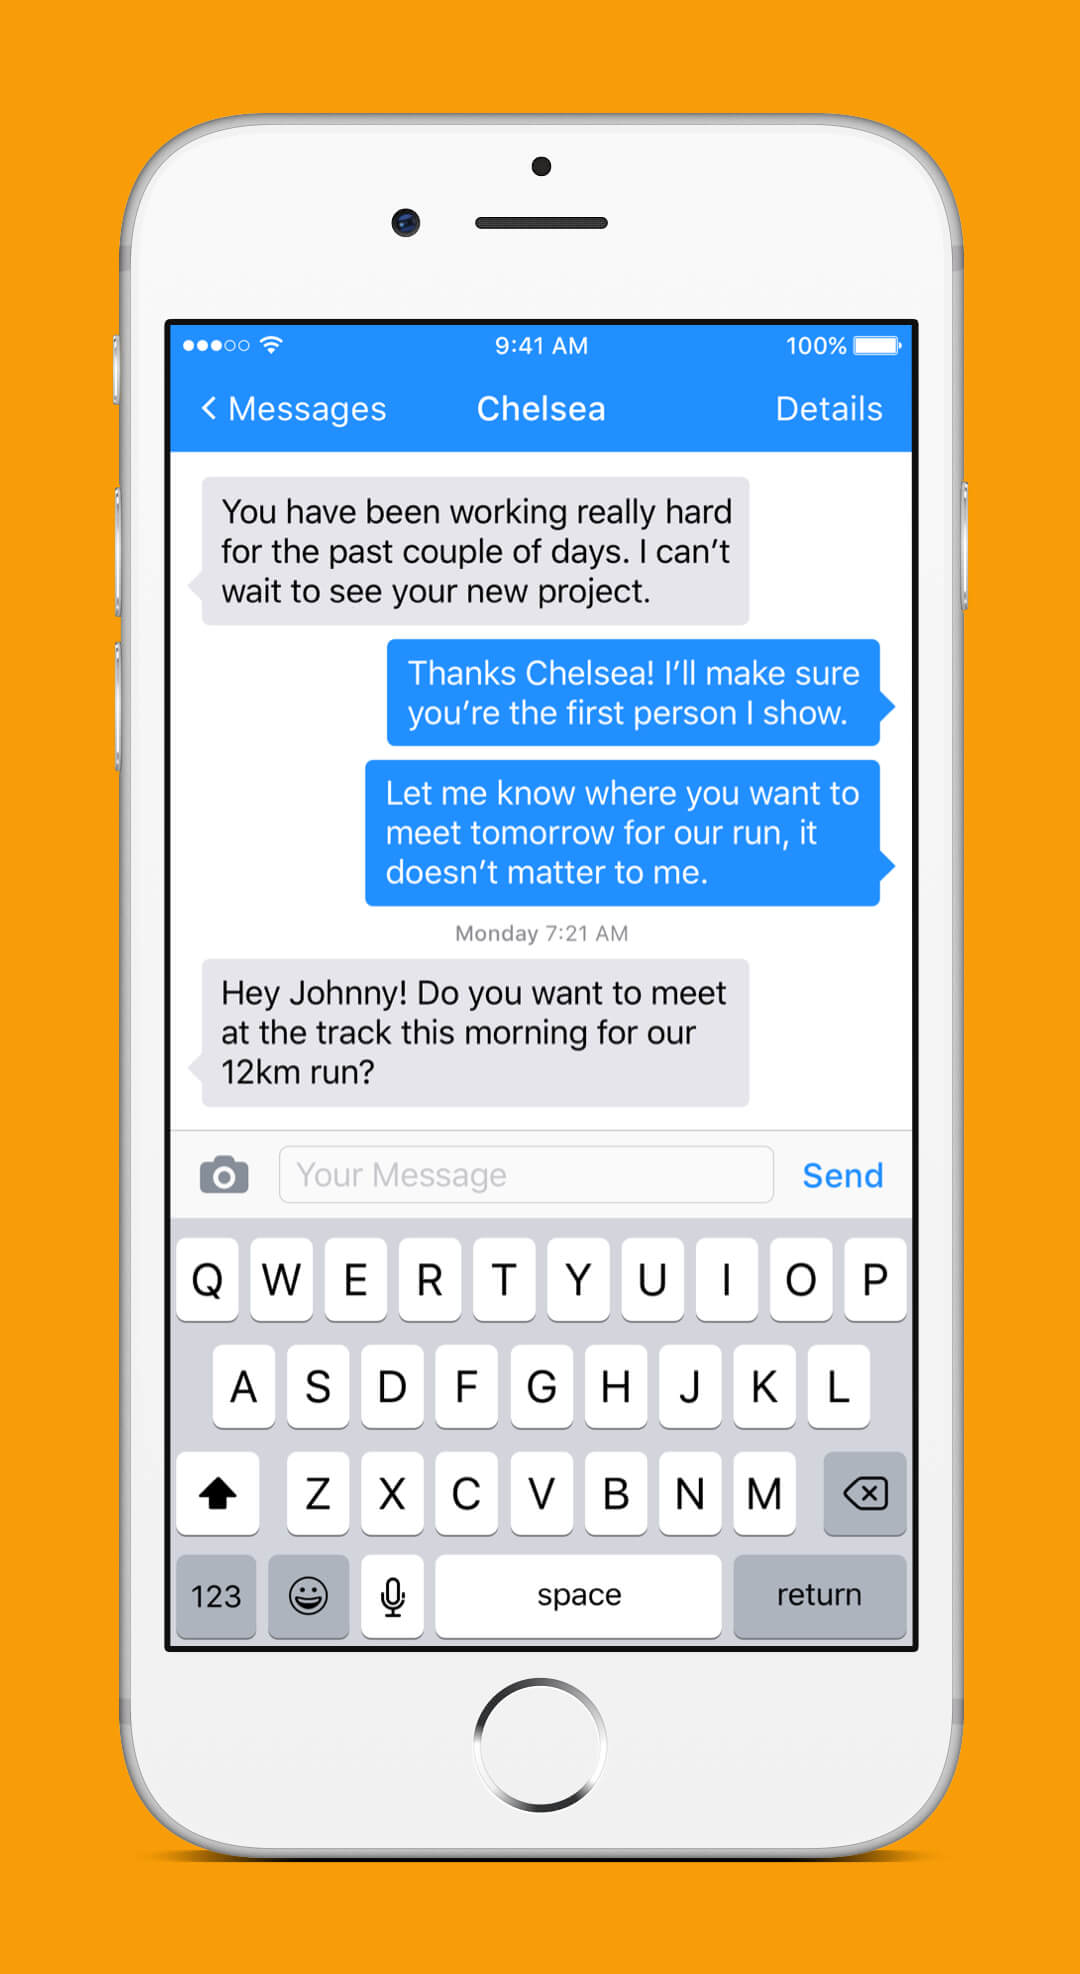 iOS 9 Redesign - Conversation Screen